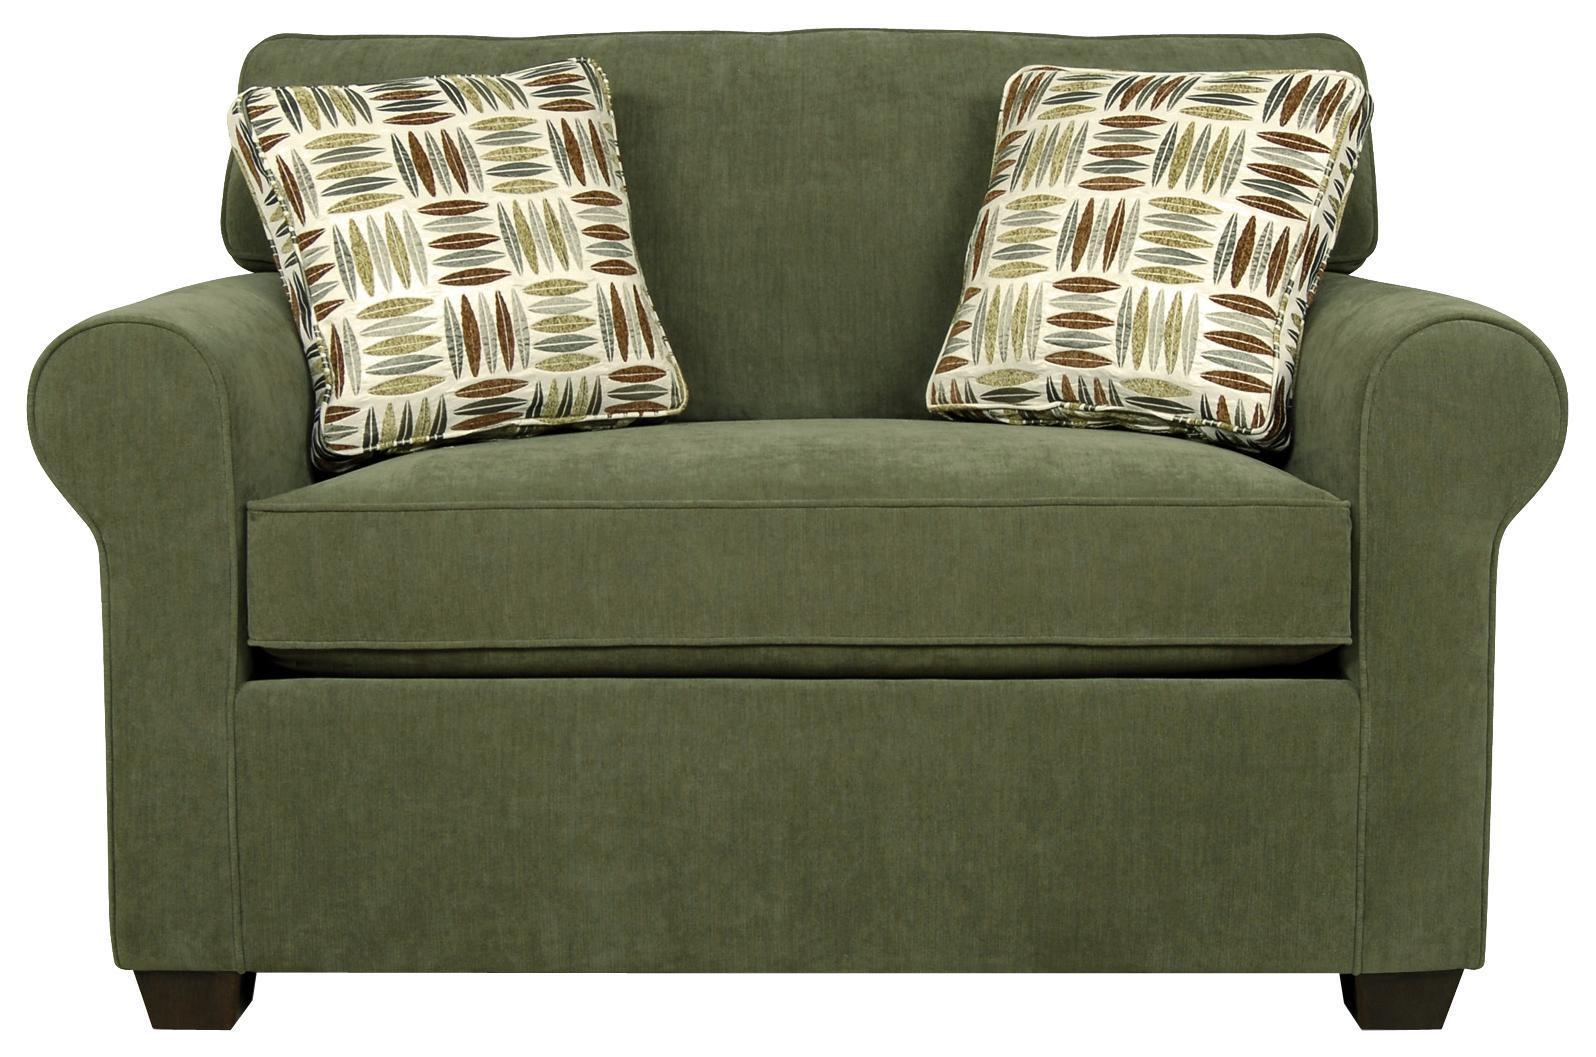 England Seabury Visco Mattress Twin Size Sleeper Sofa For Living Pertaining To Loveseat Twin Sleeper Sofas (Image 3 of 20)